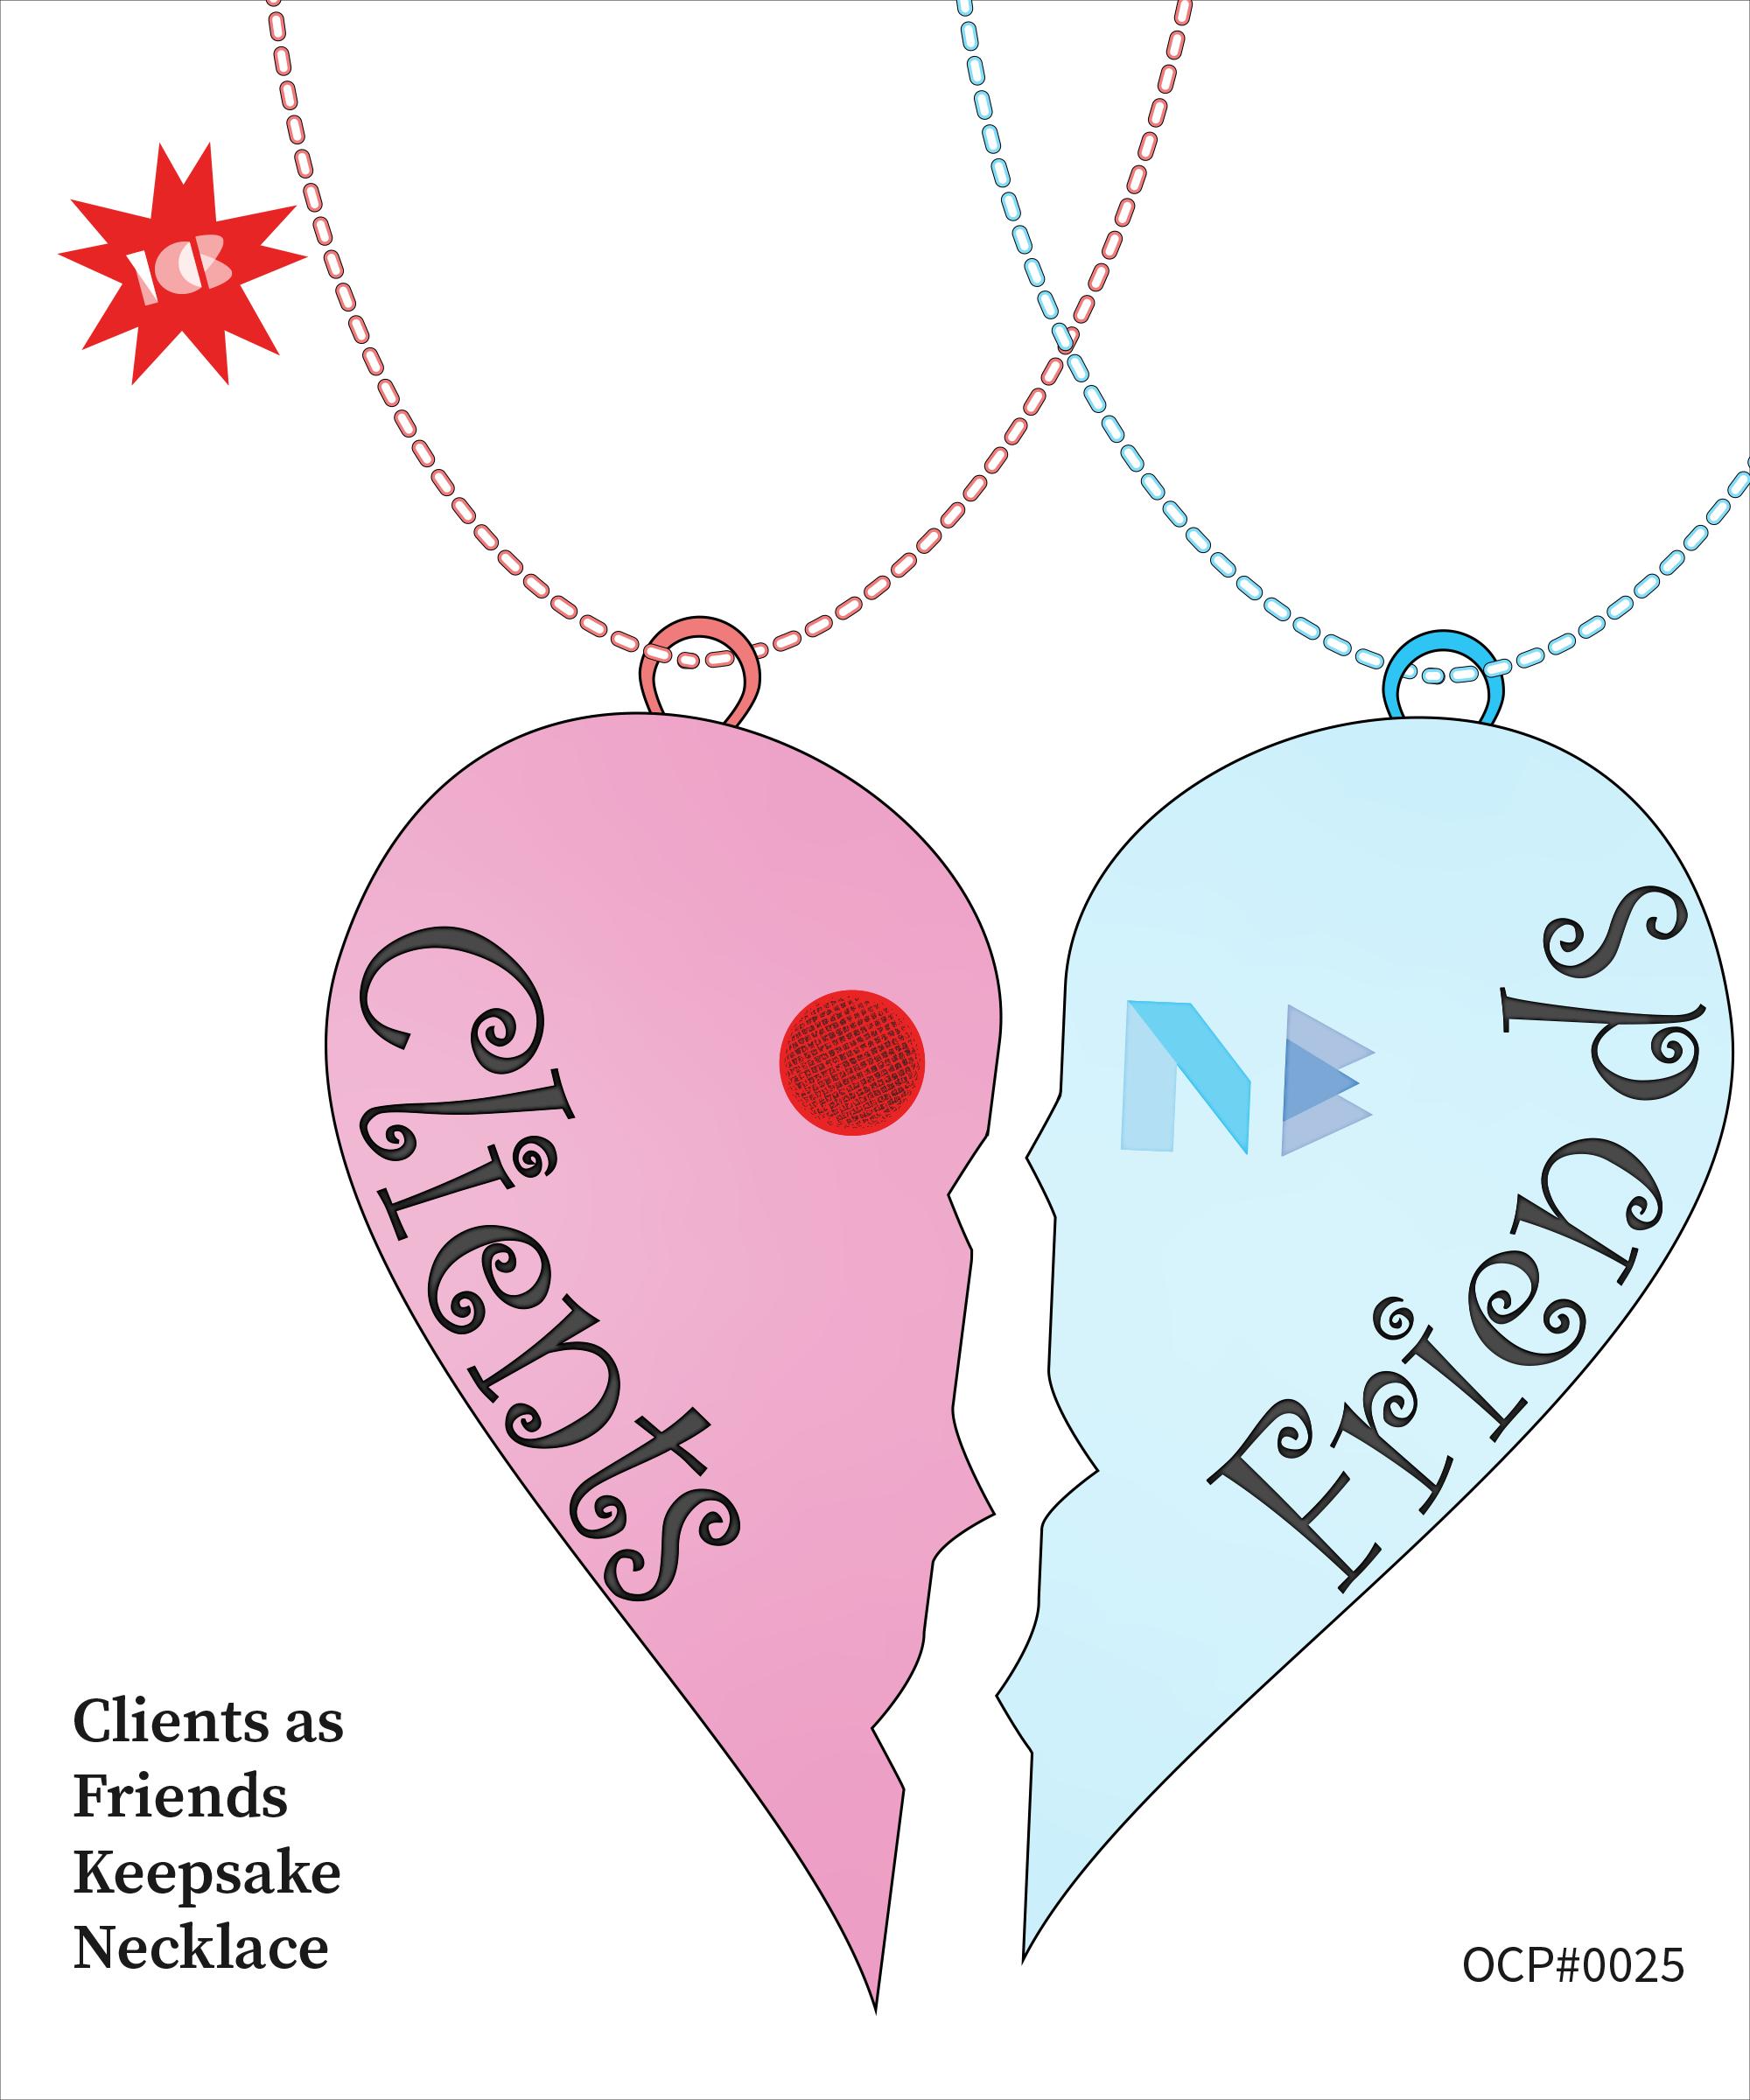 Clients as Friends.png